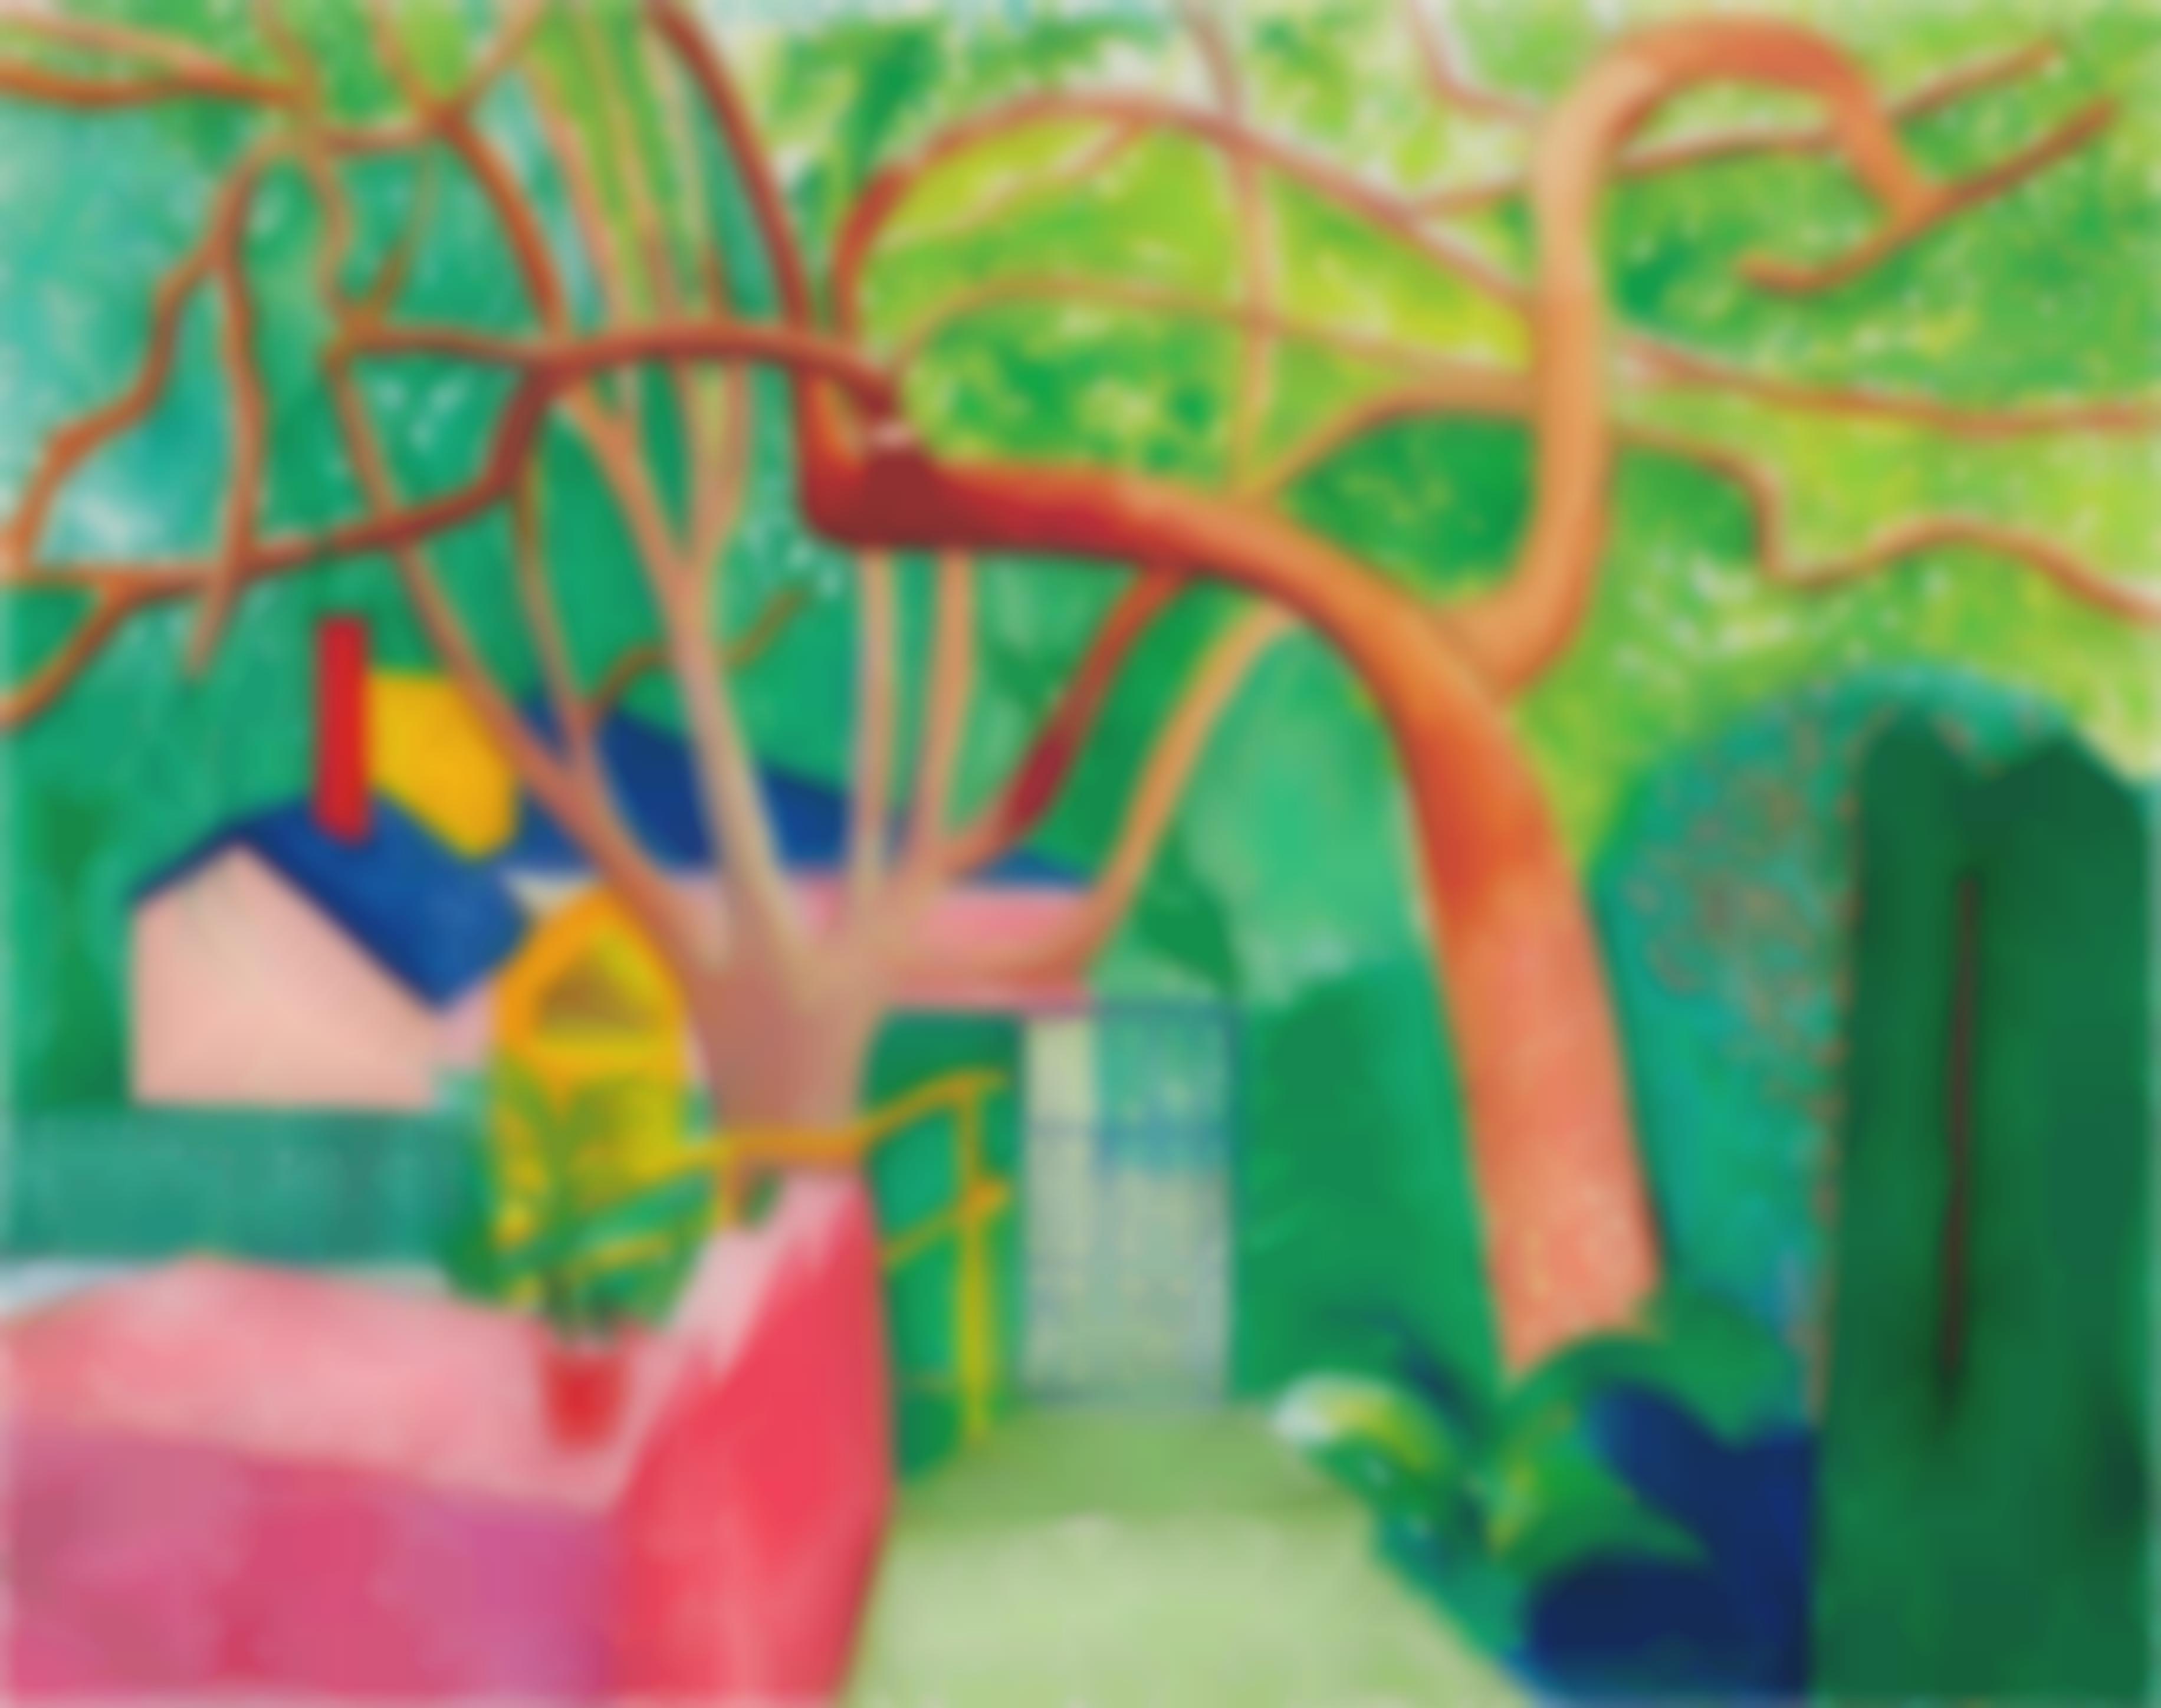 David Hockney-The Gate-2000